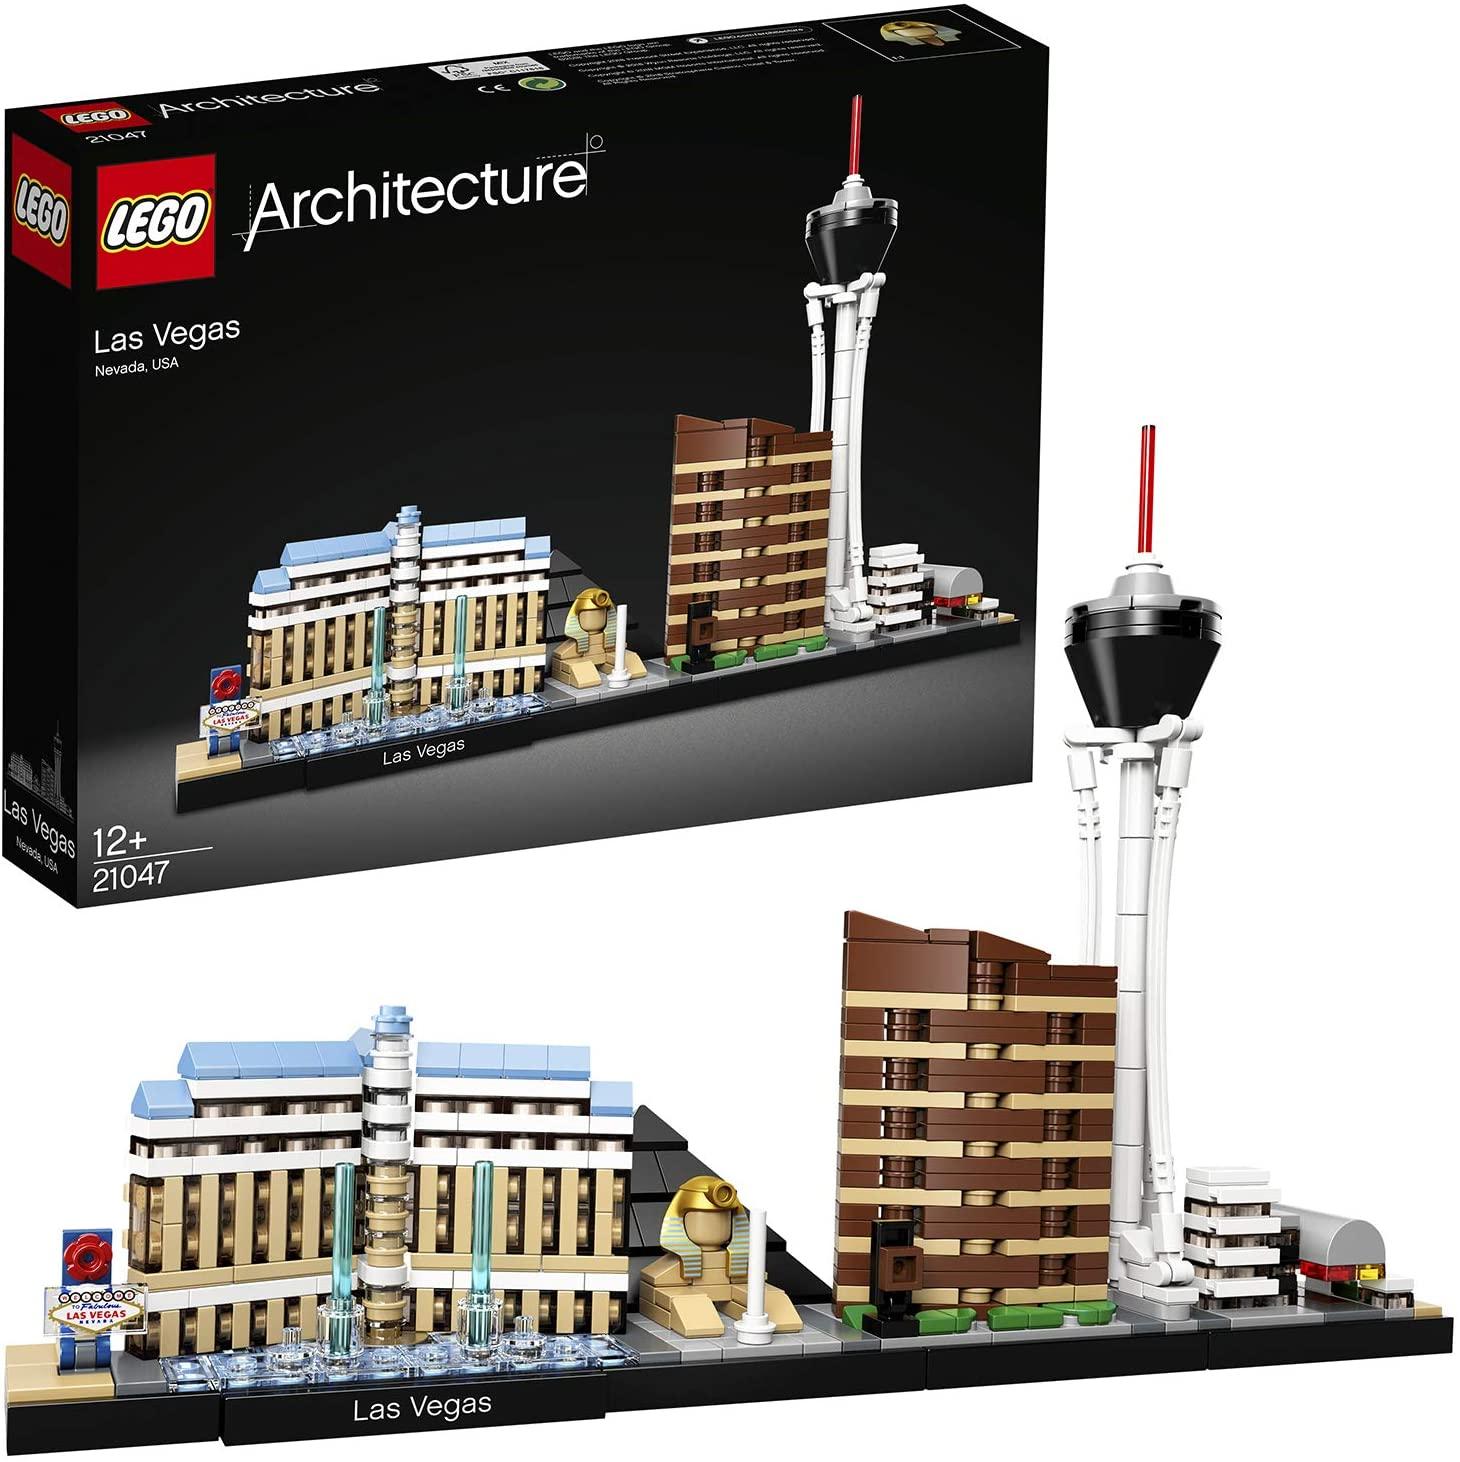 LEGO Architecture Las Vegas Building Set 21047 £31.50 delivered, using code @ Hamleys